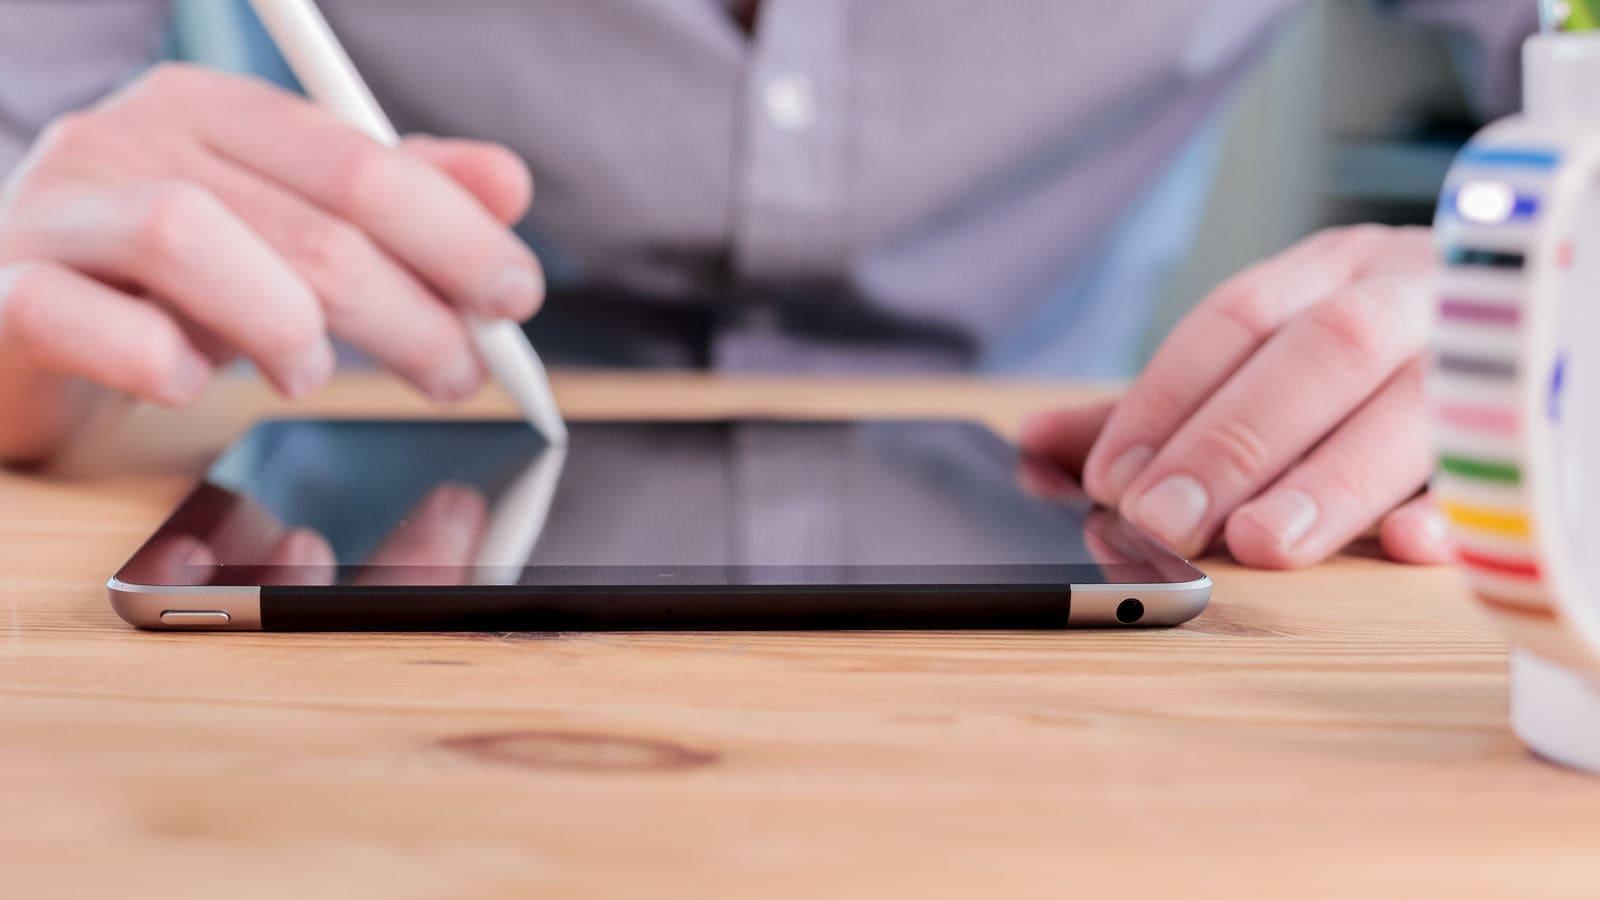 iPad Apple Pencil